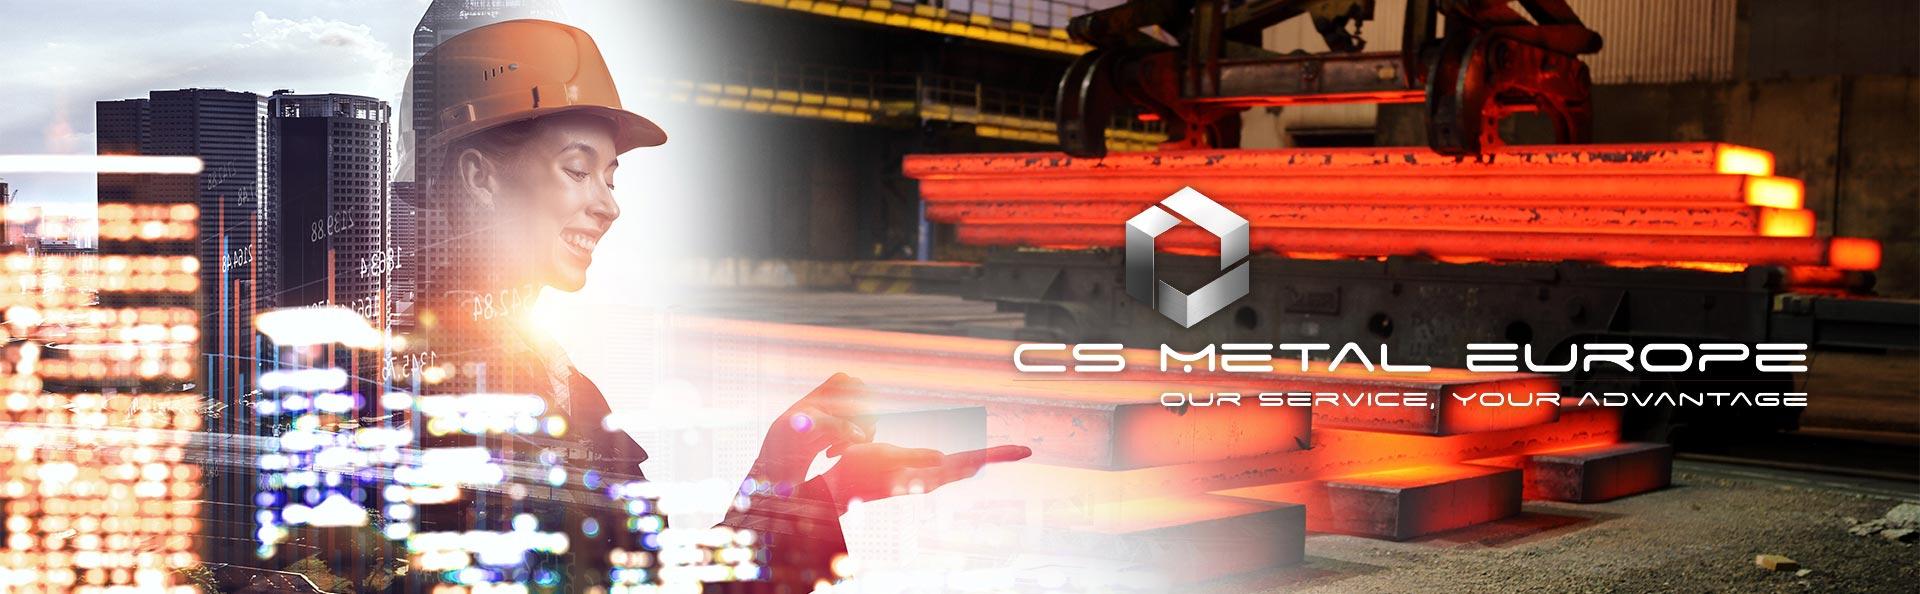 CS METAL - Acciai Speciali